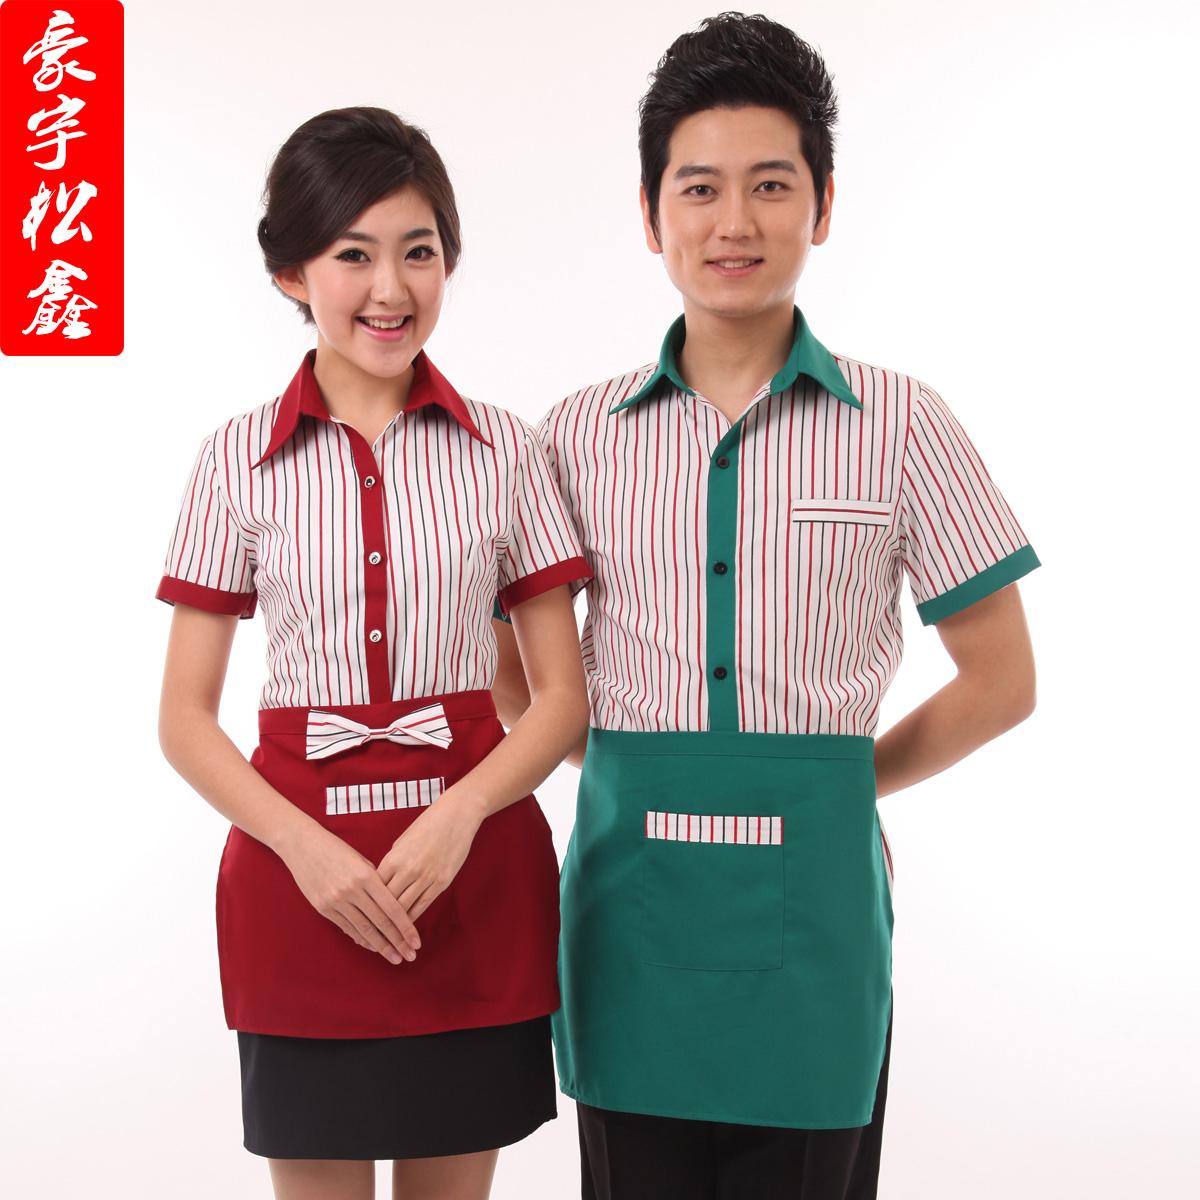 одежда барменов